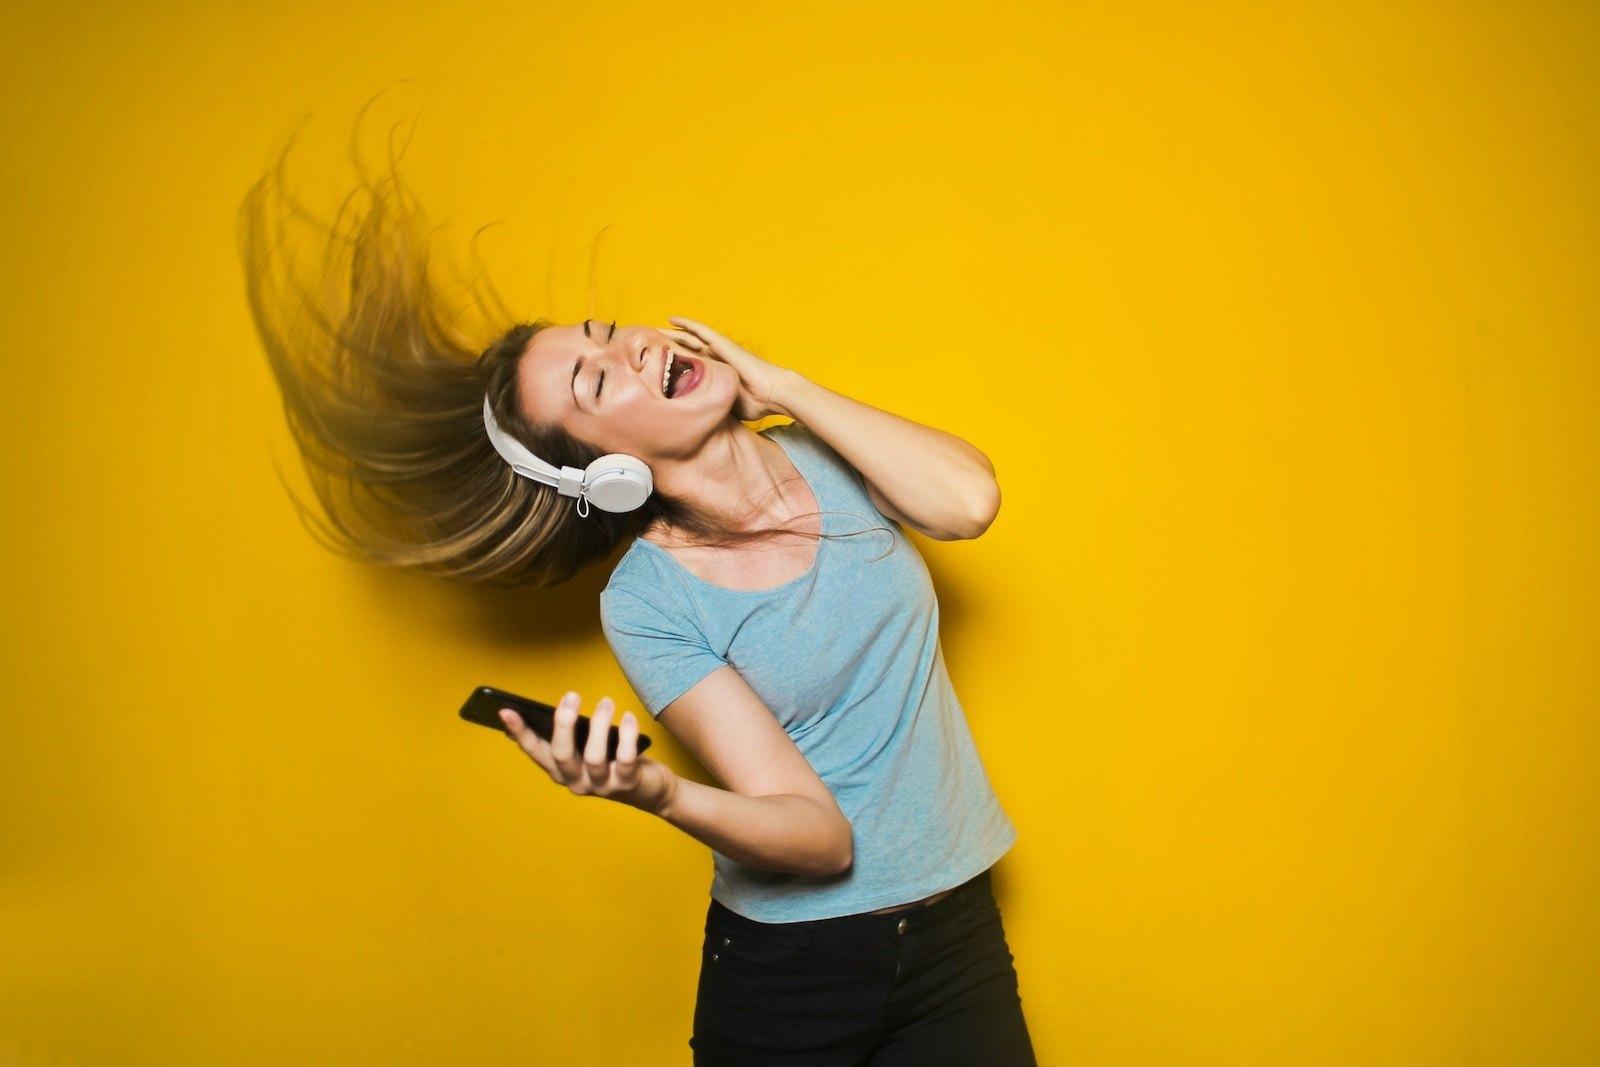 music-changes-mood-bruce-mars-558710-unsplash.jpg